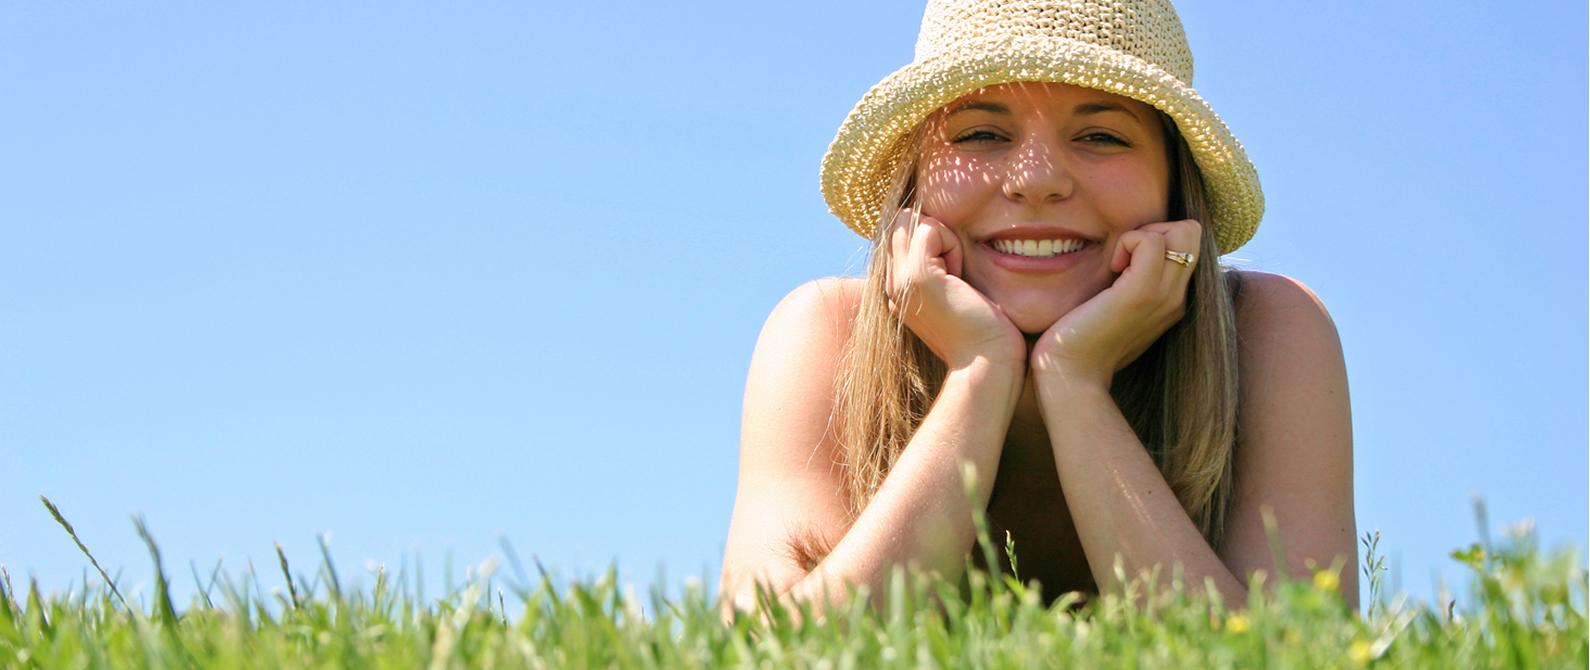 smiling_girl